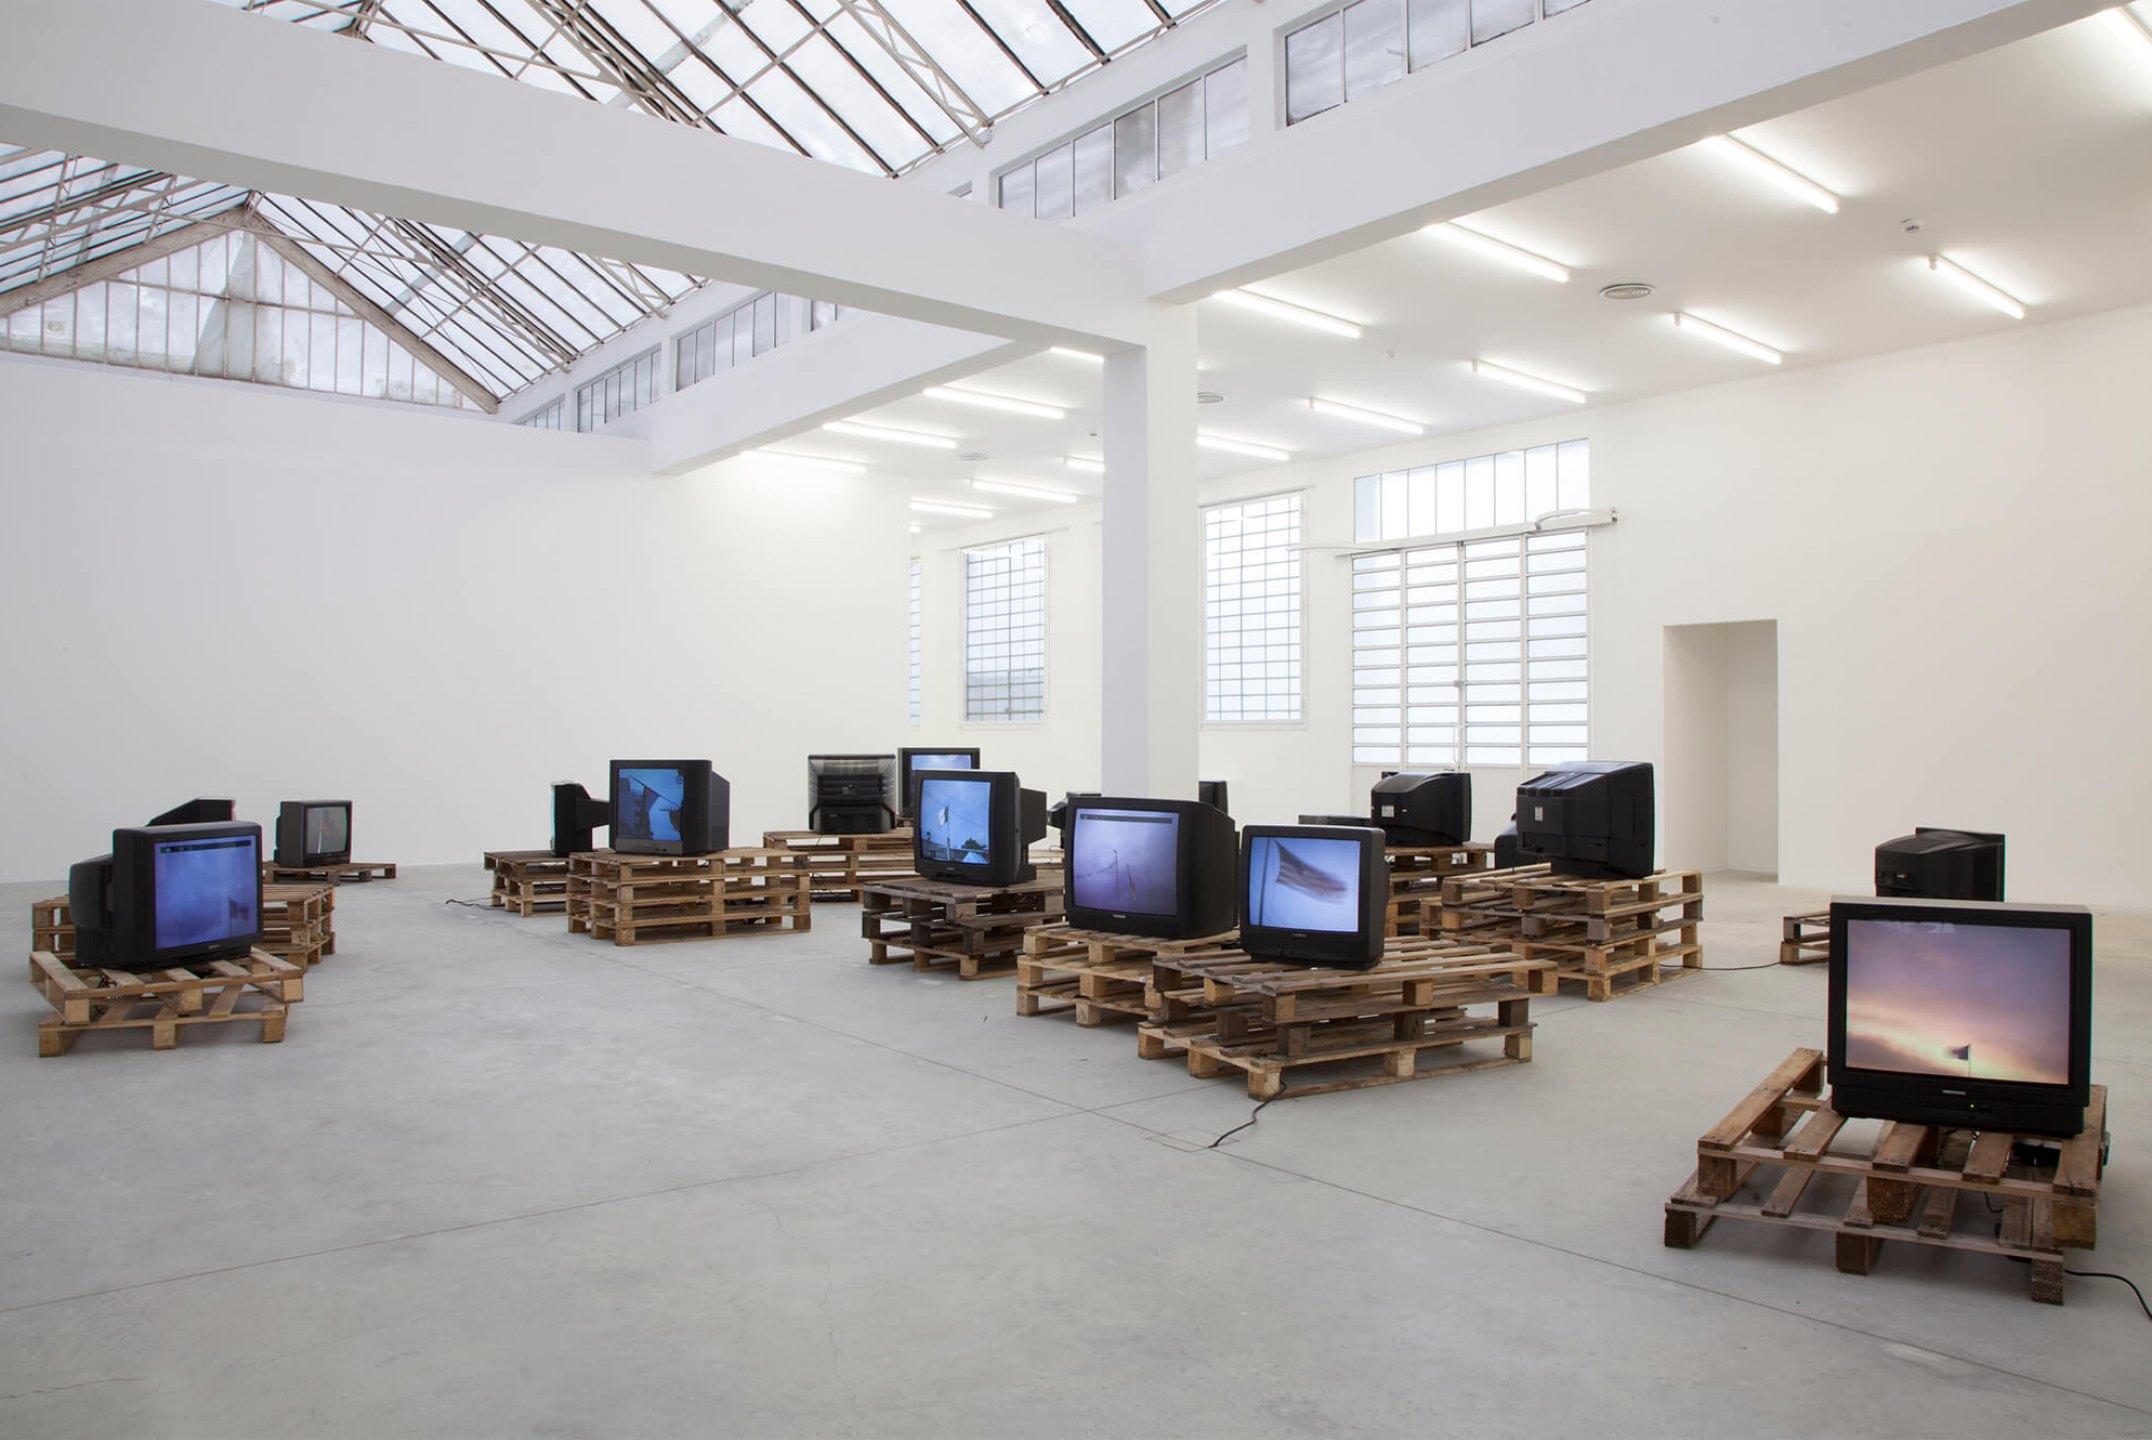 Paulo Nazareth,&nbsp;<em>Banderas Rotas</em>, Galleria Franco Noero, Turin, 2014 - Mendes Wood DM